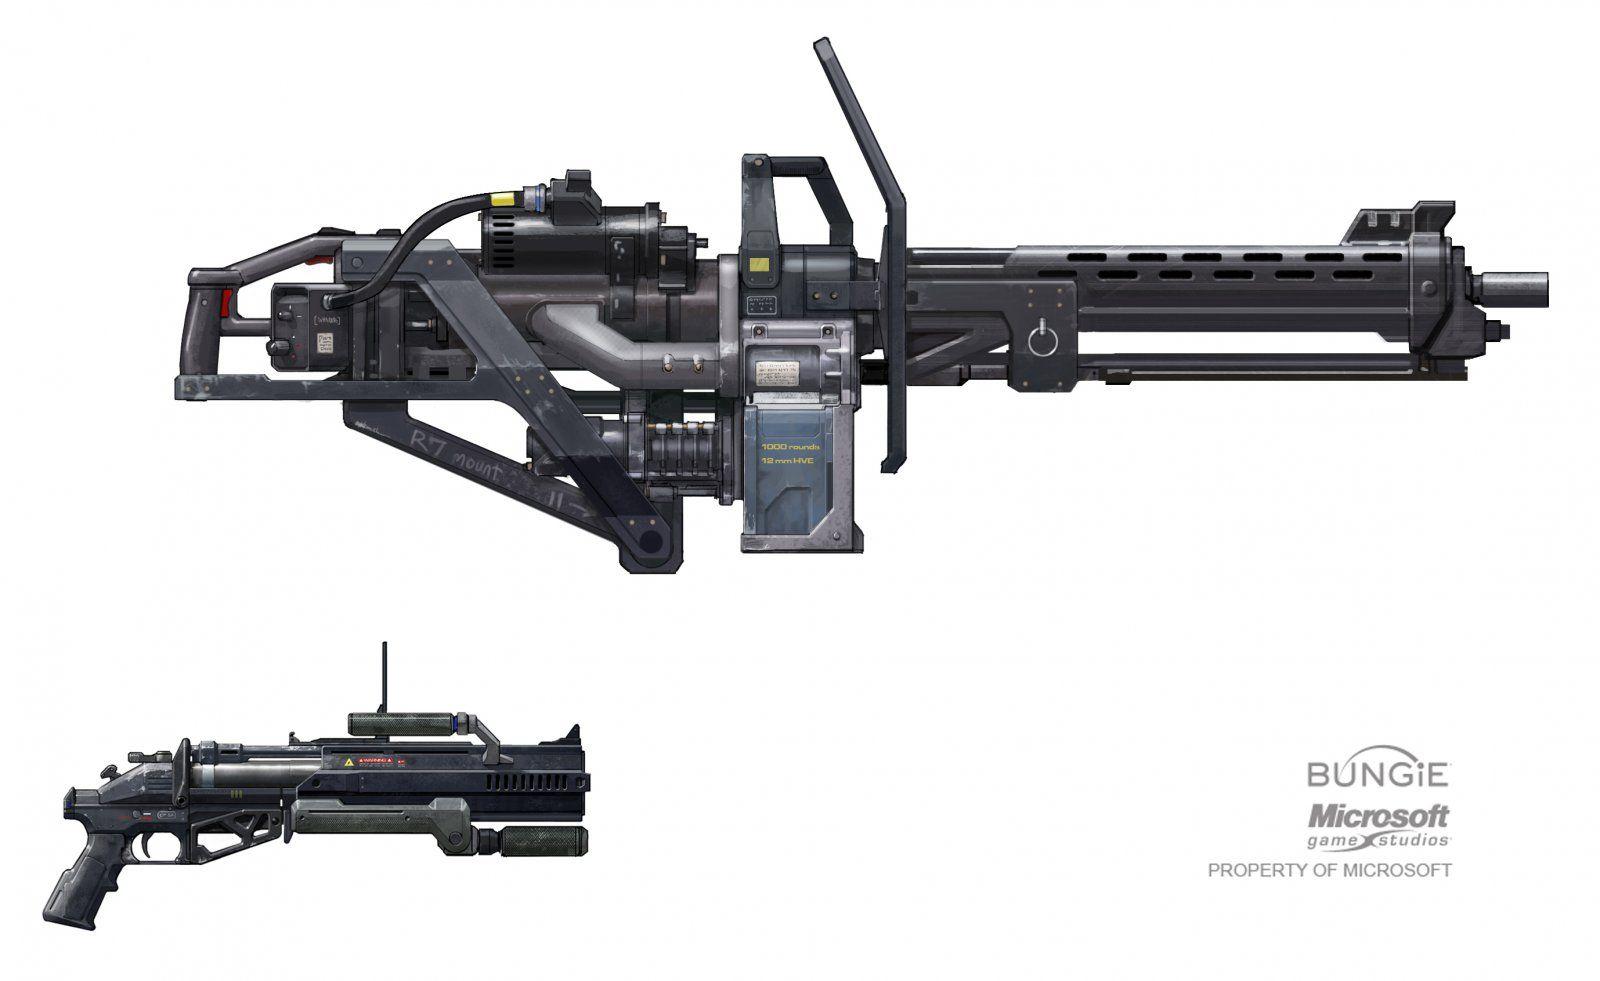 X981 Detachable Turret 2d Sci Fi Gun Spartan